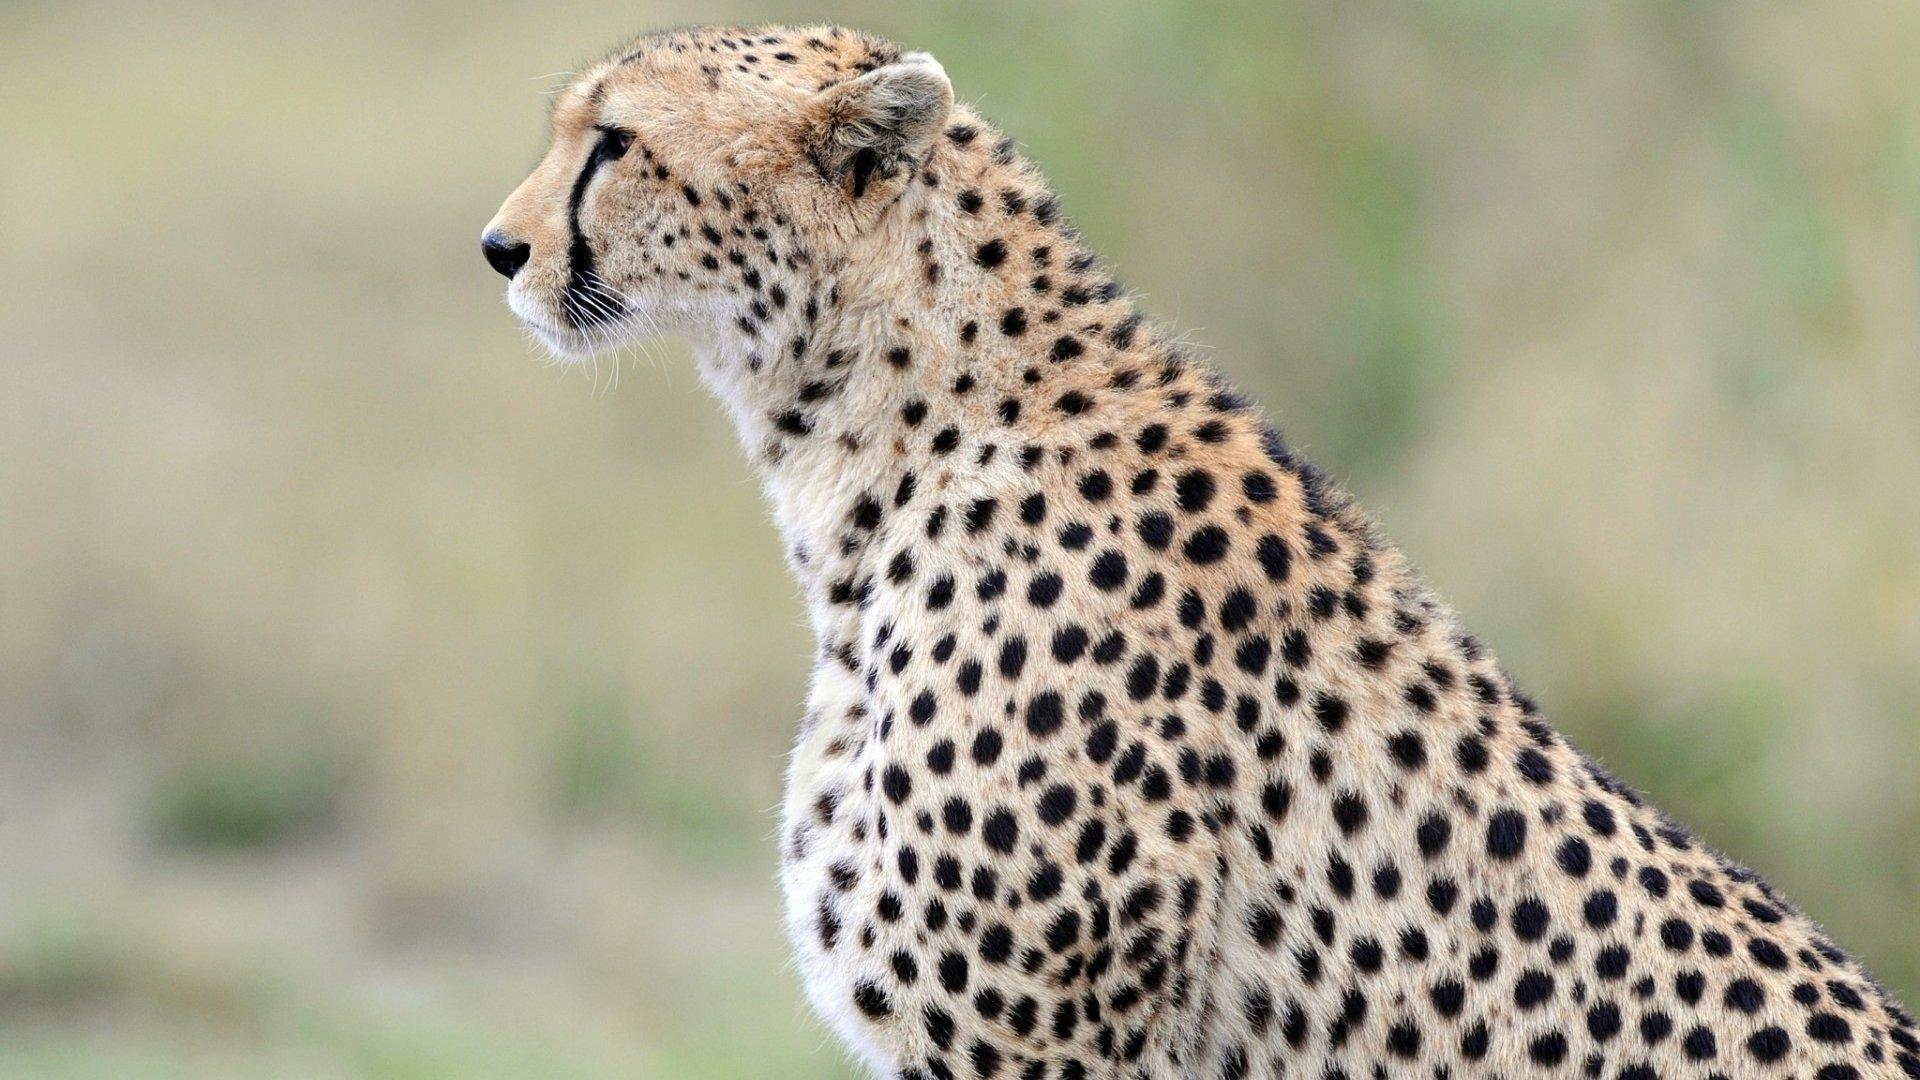 Cheetah Wallpapers HD Download